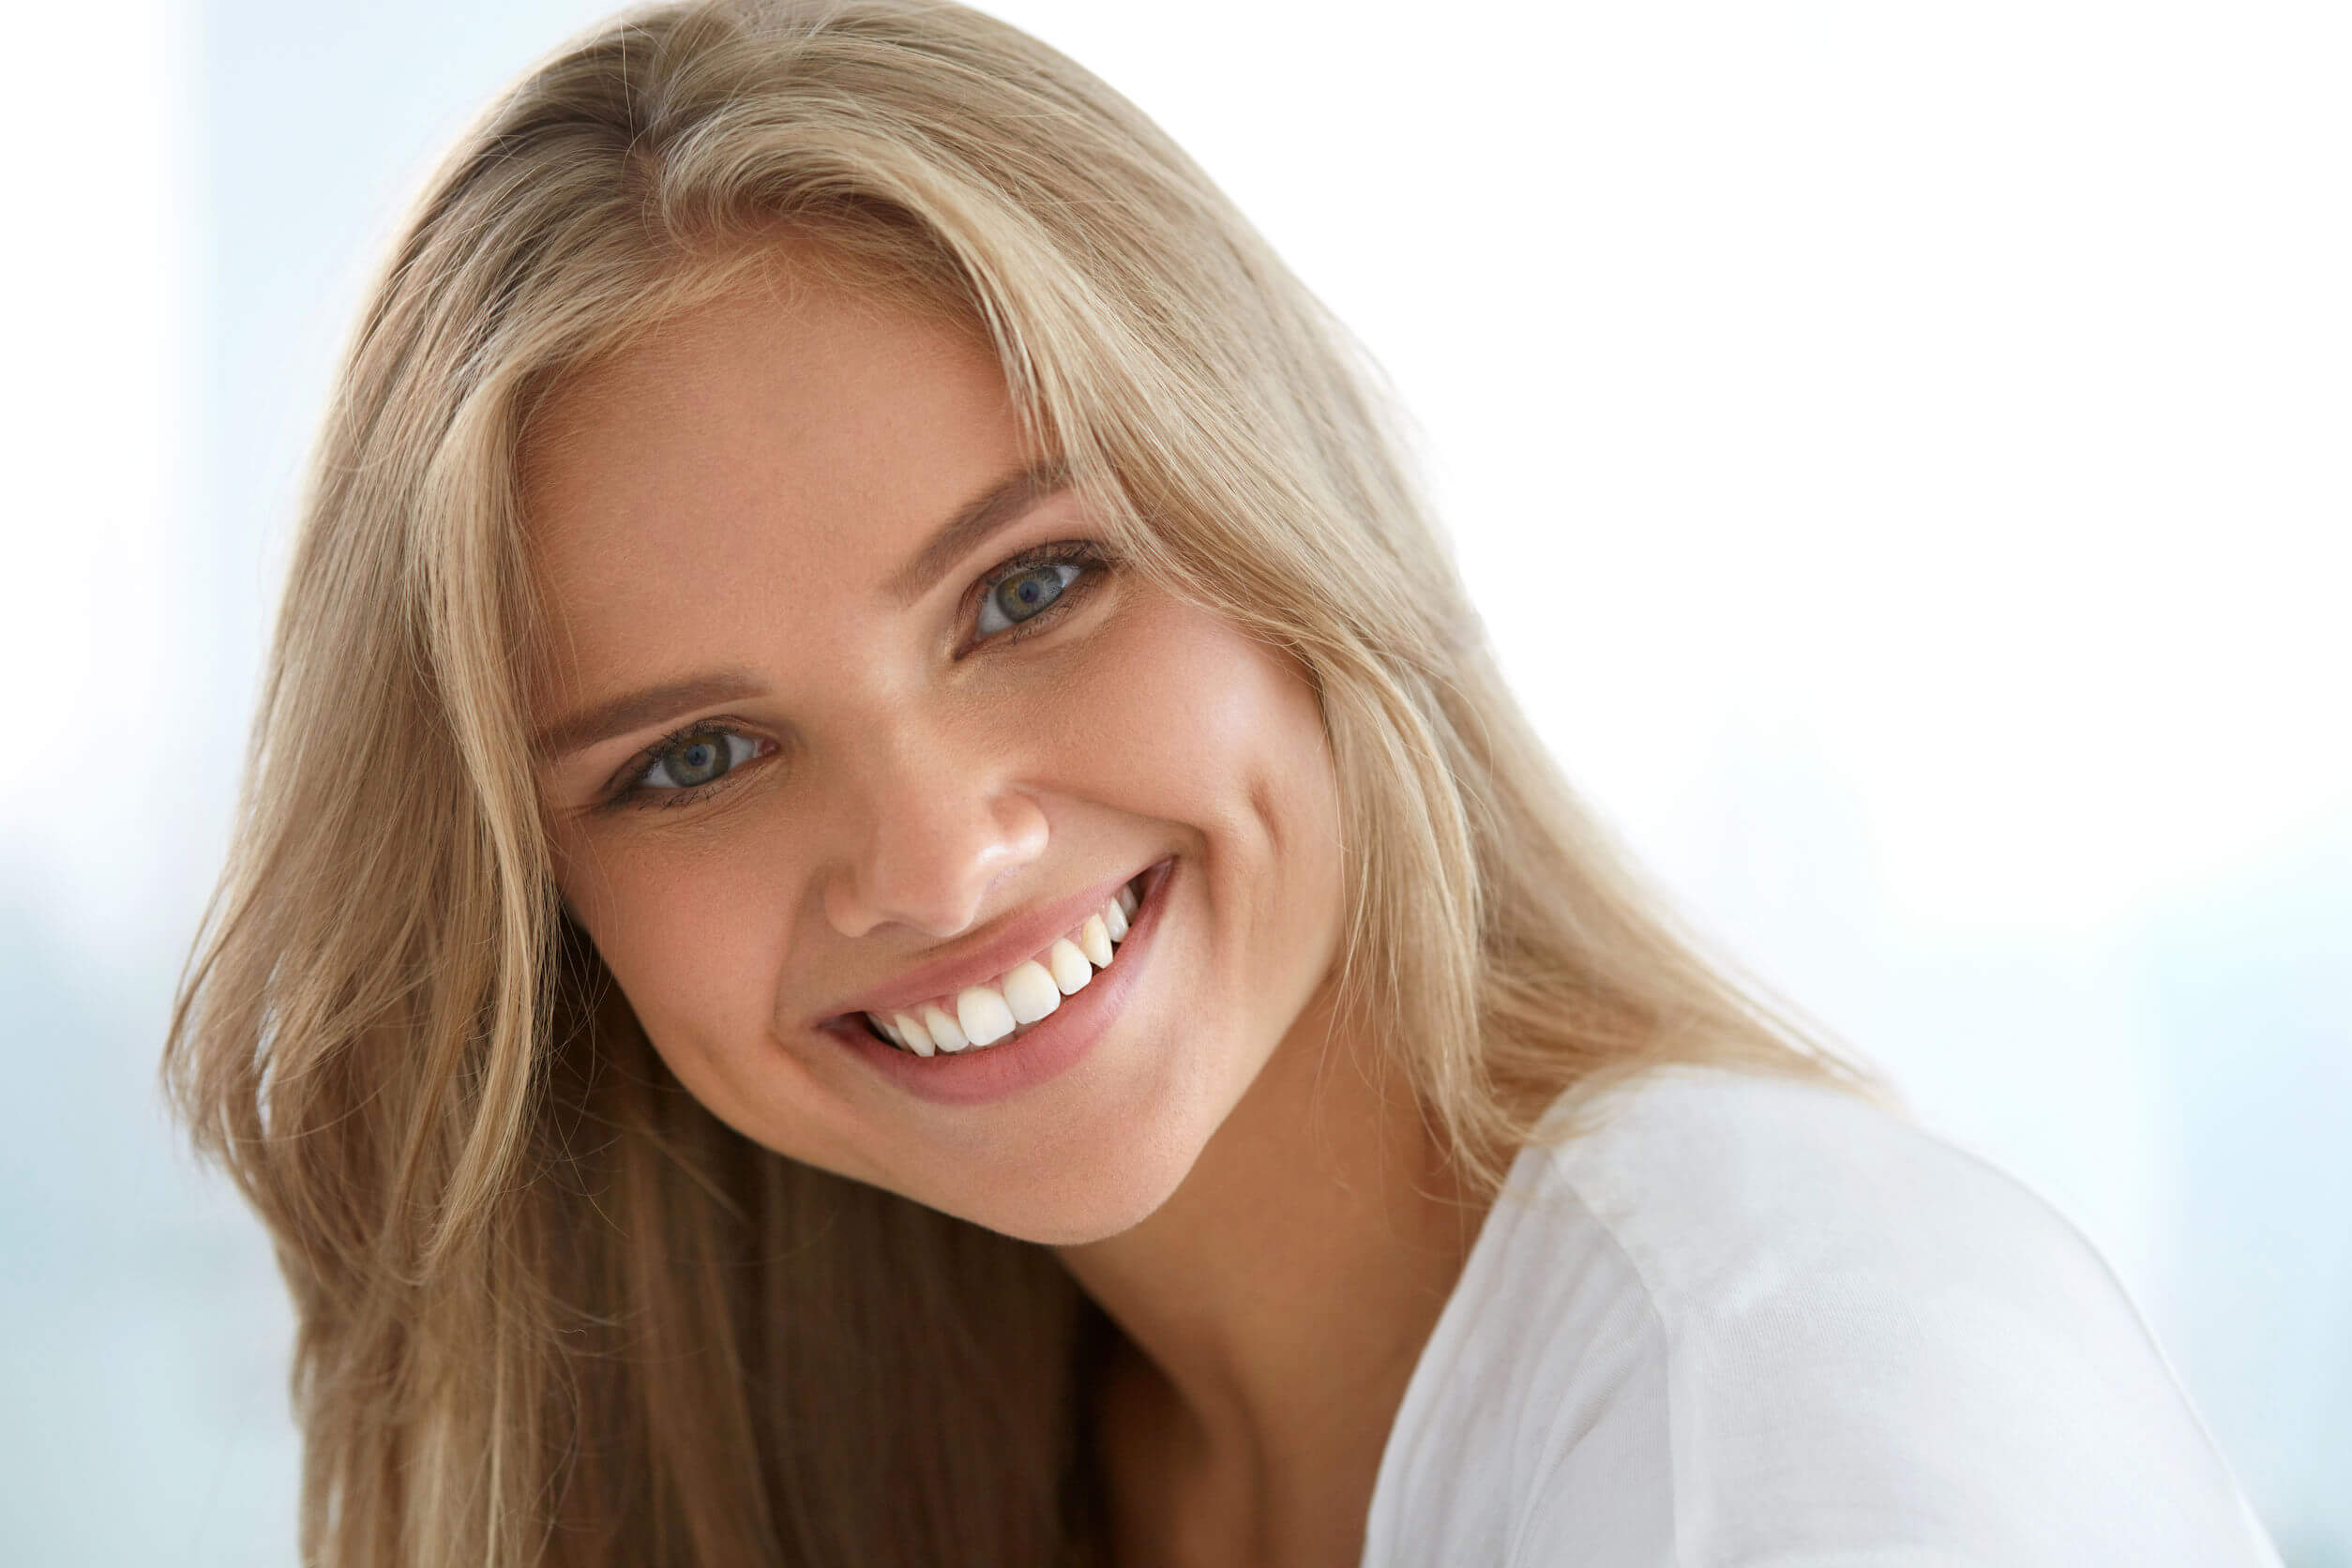 Protesi labbra - aumento labbra definitivo - Dr. Urso